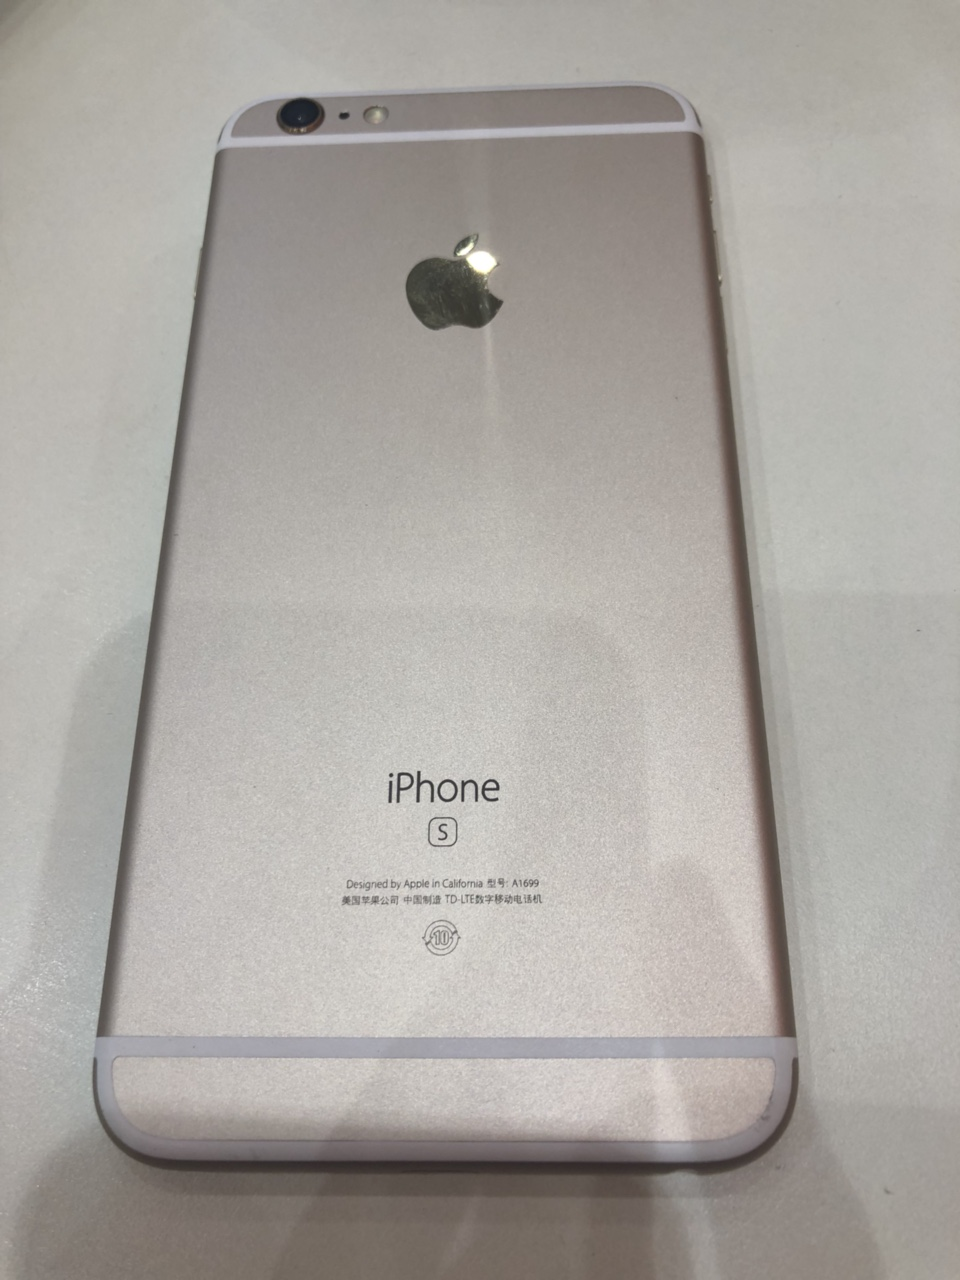 iPhone6s 國行三網通用 自己用的手機 現在低價甩了 16g 要的聯系我